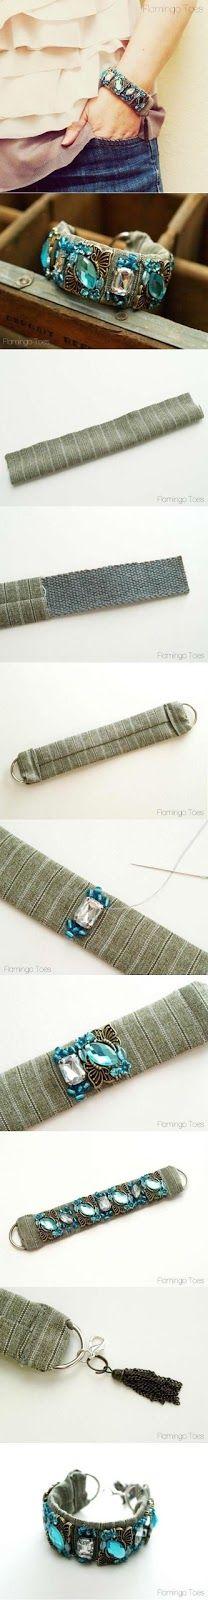 bracelet fabric recycled